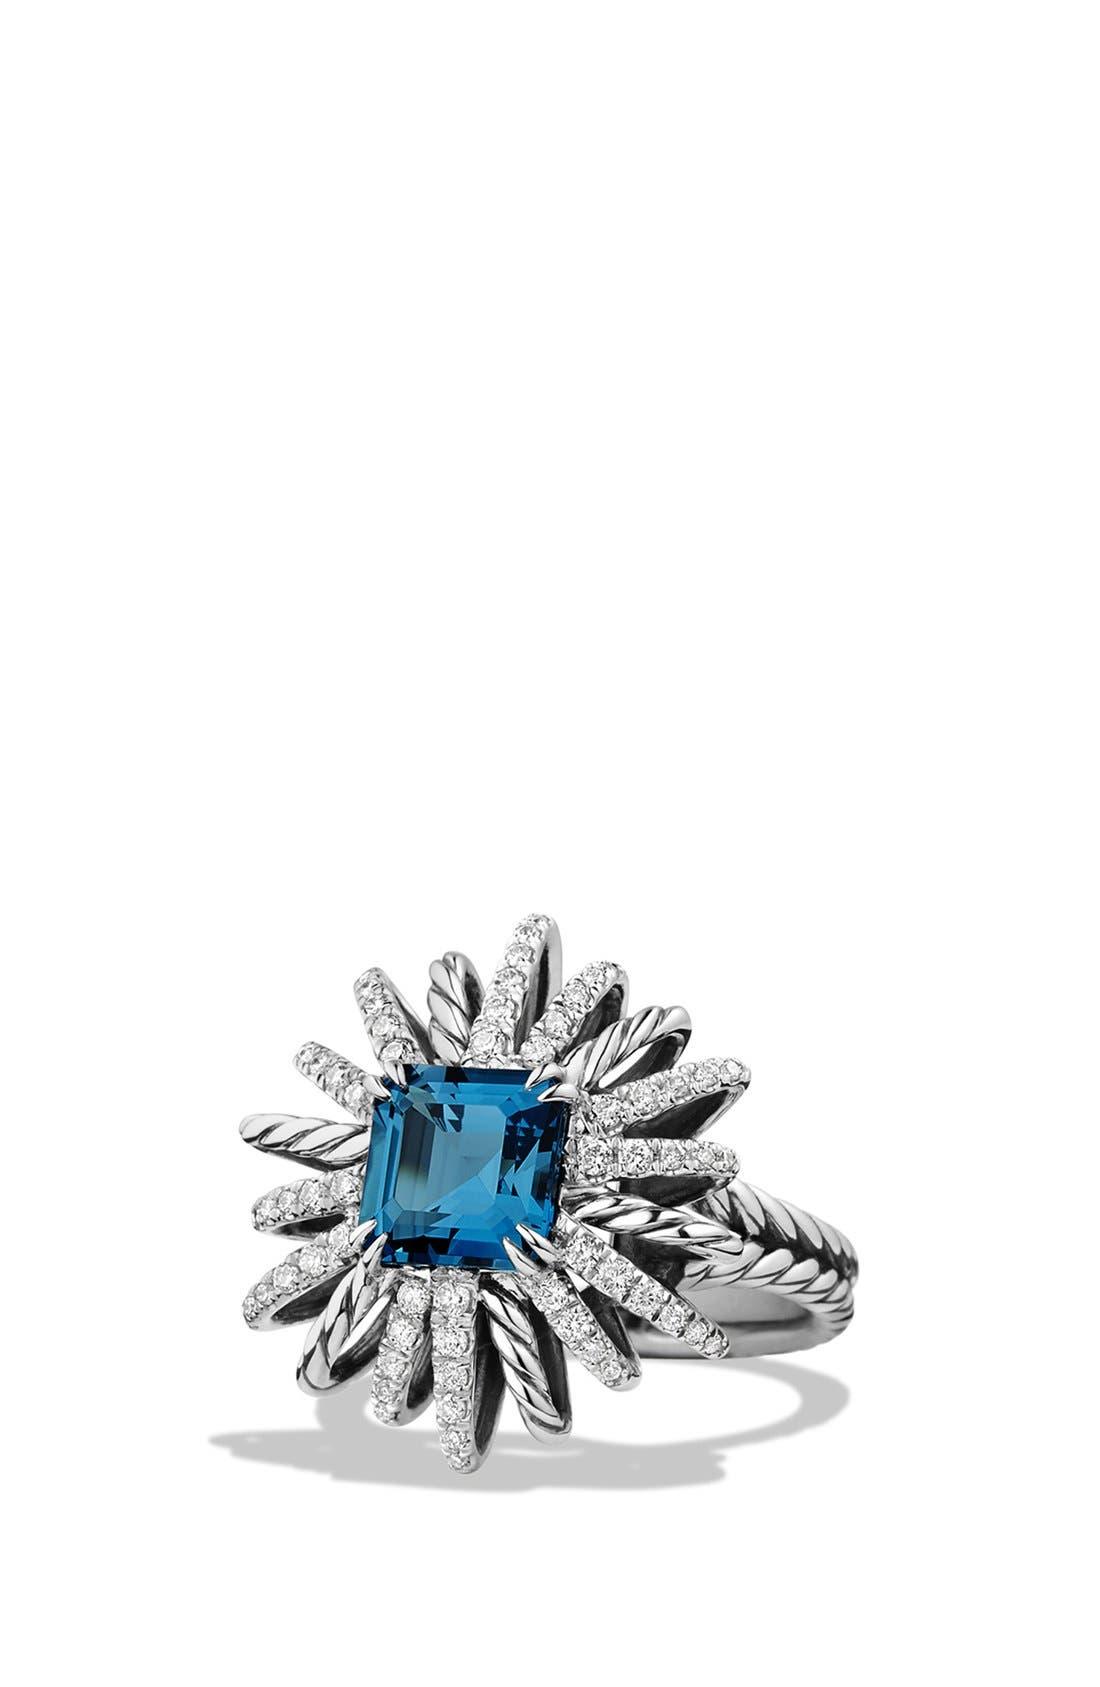 DAVID YURMAN,                             'Starburst' Ring with Diamonds in Silver,                             Main thumbnail 1, color,                             402